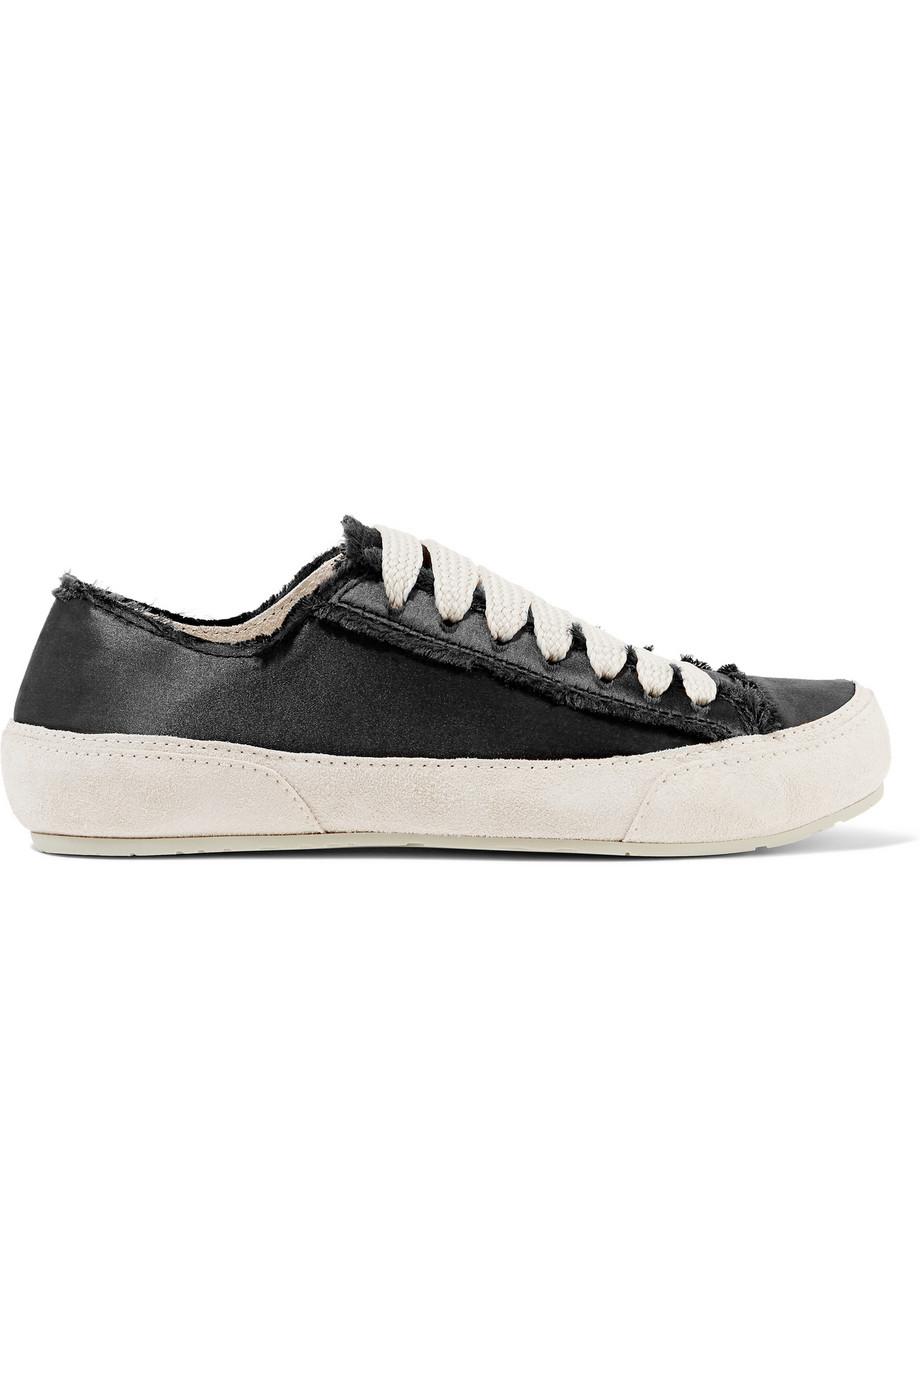 pedro garcia parson suede trimmed satin sneakers in black